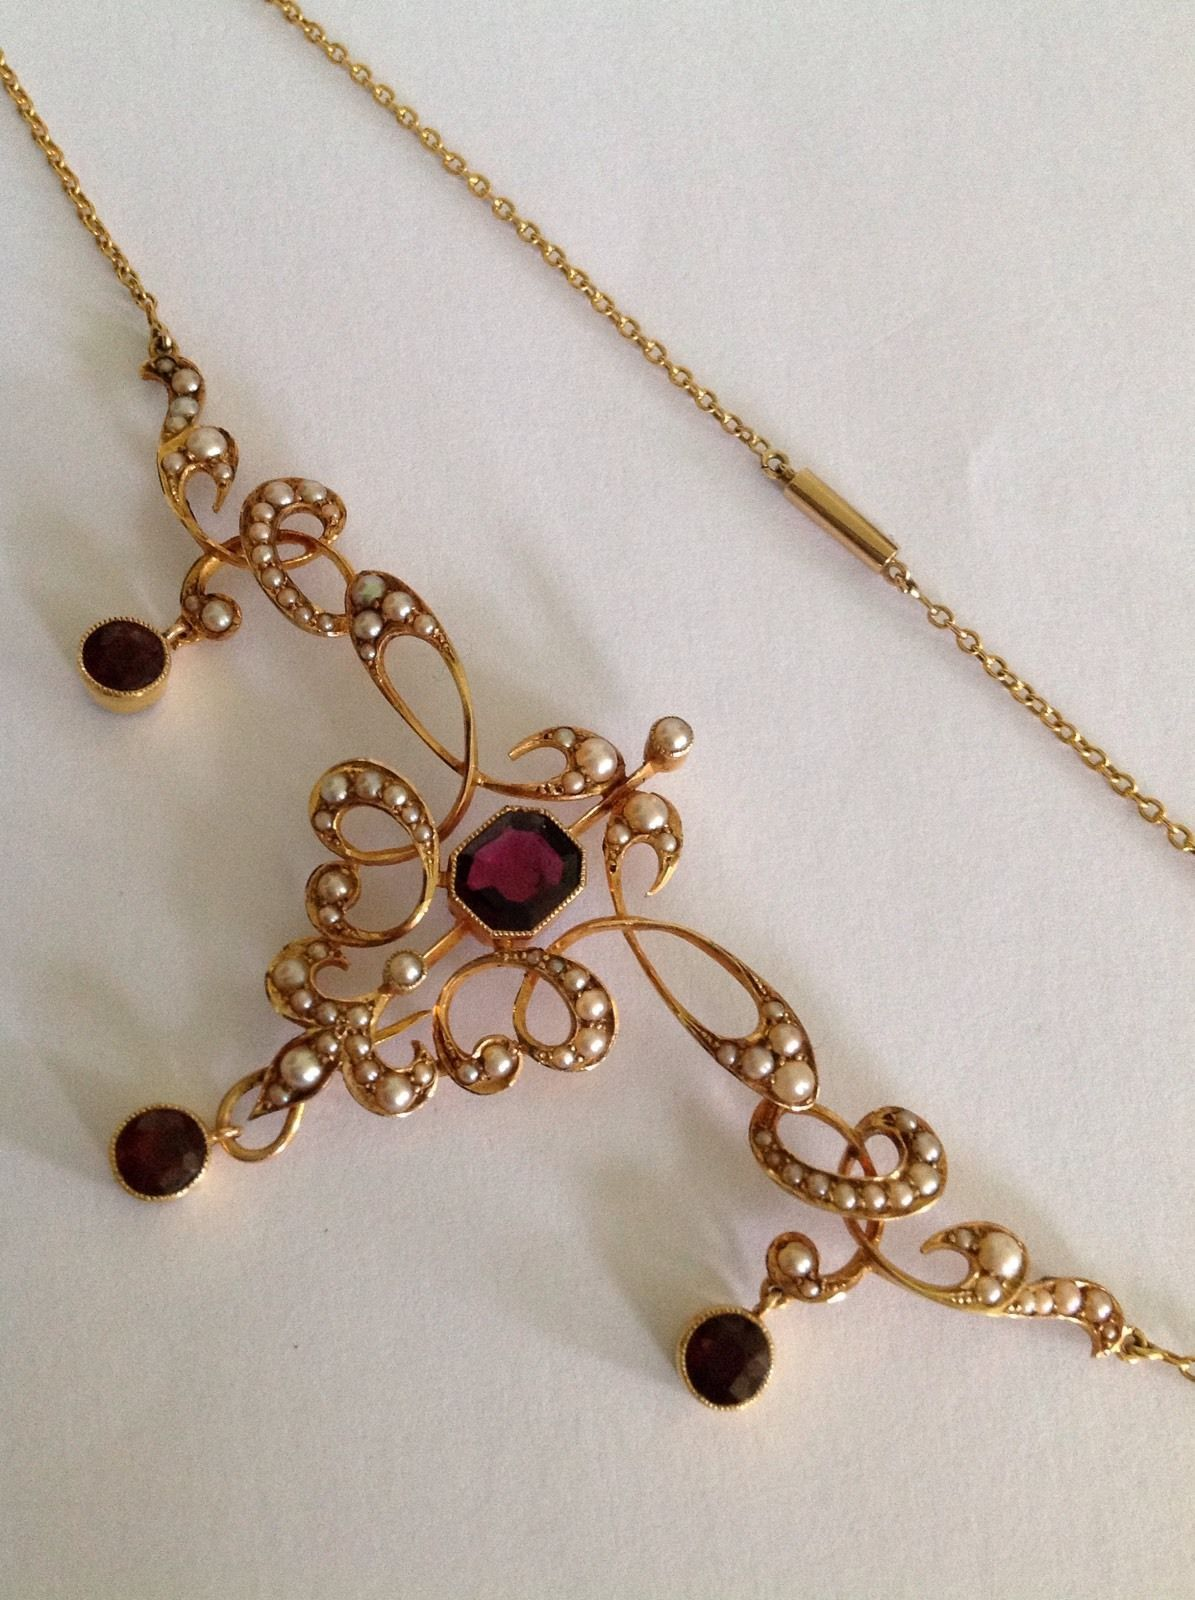 ac672f570 Beautiful Art Nouveau 15ct Gold Natural Seed Pearl & Garnet Set Necklace |  eBay Garnet Jewelry